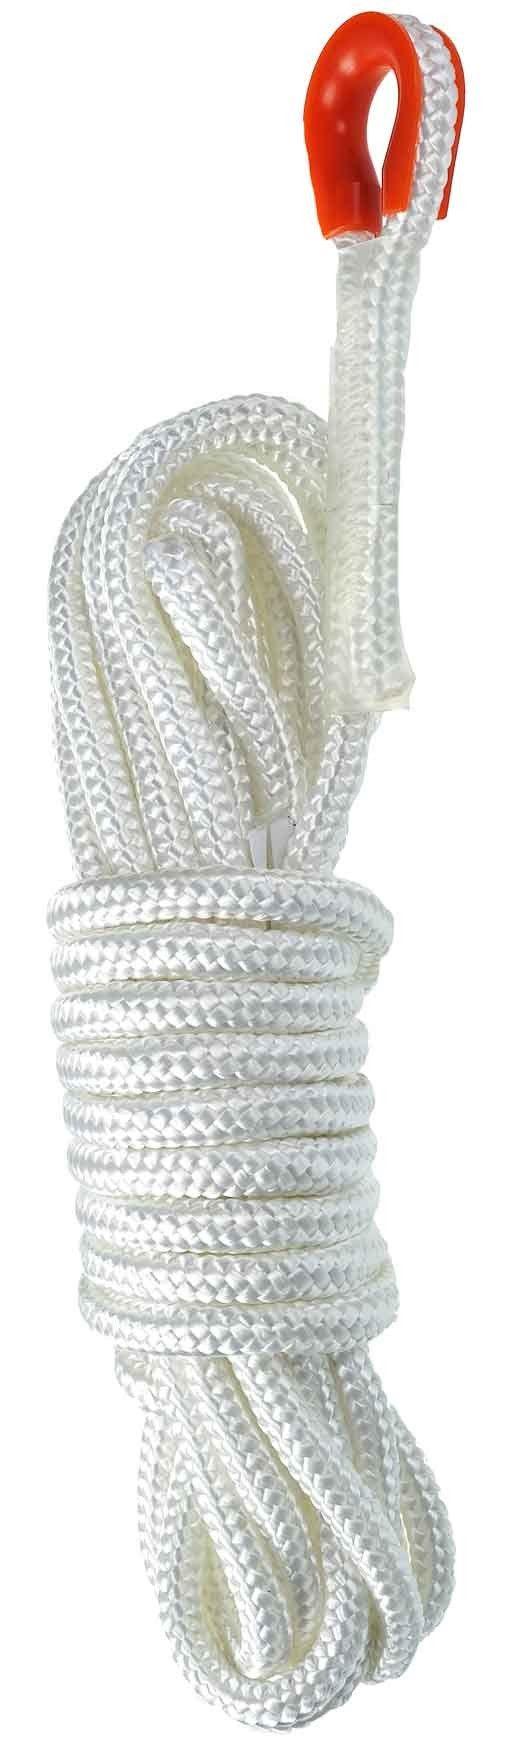 15 Meter 12mm diameter Static Rope, White